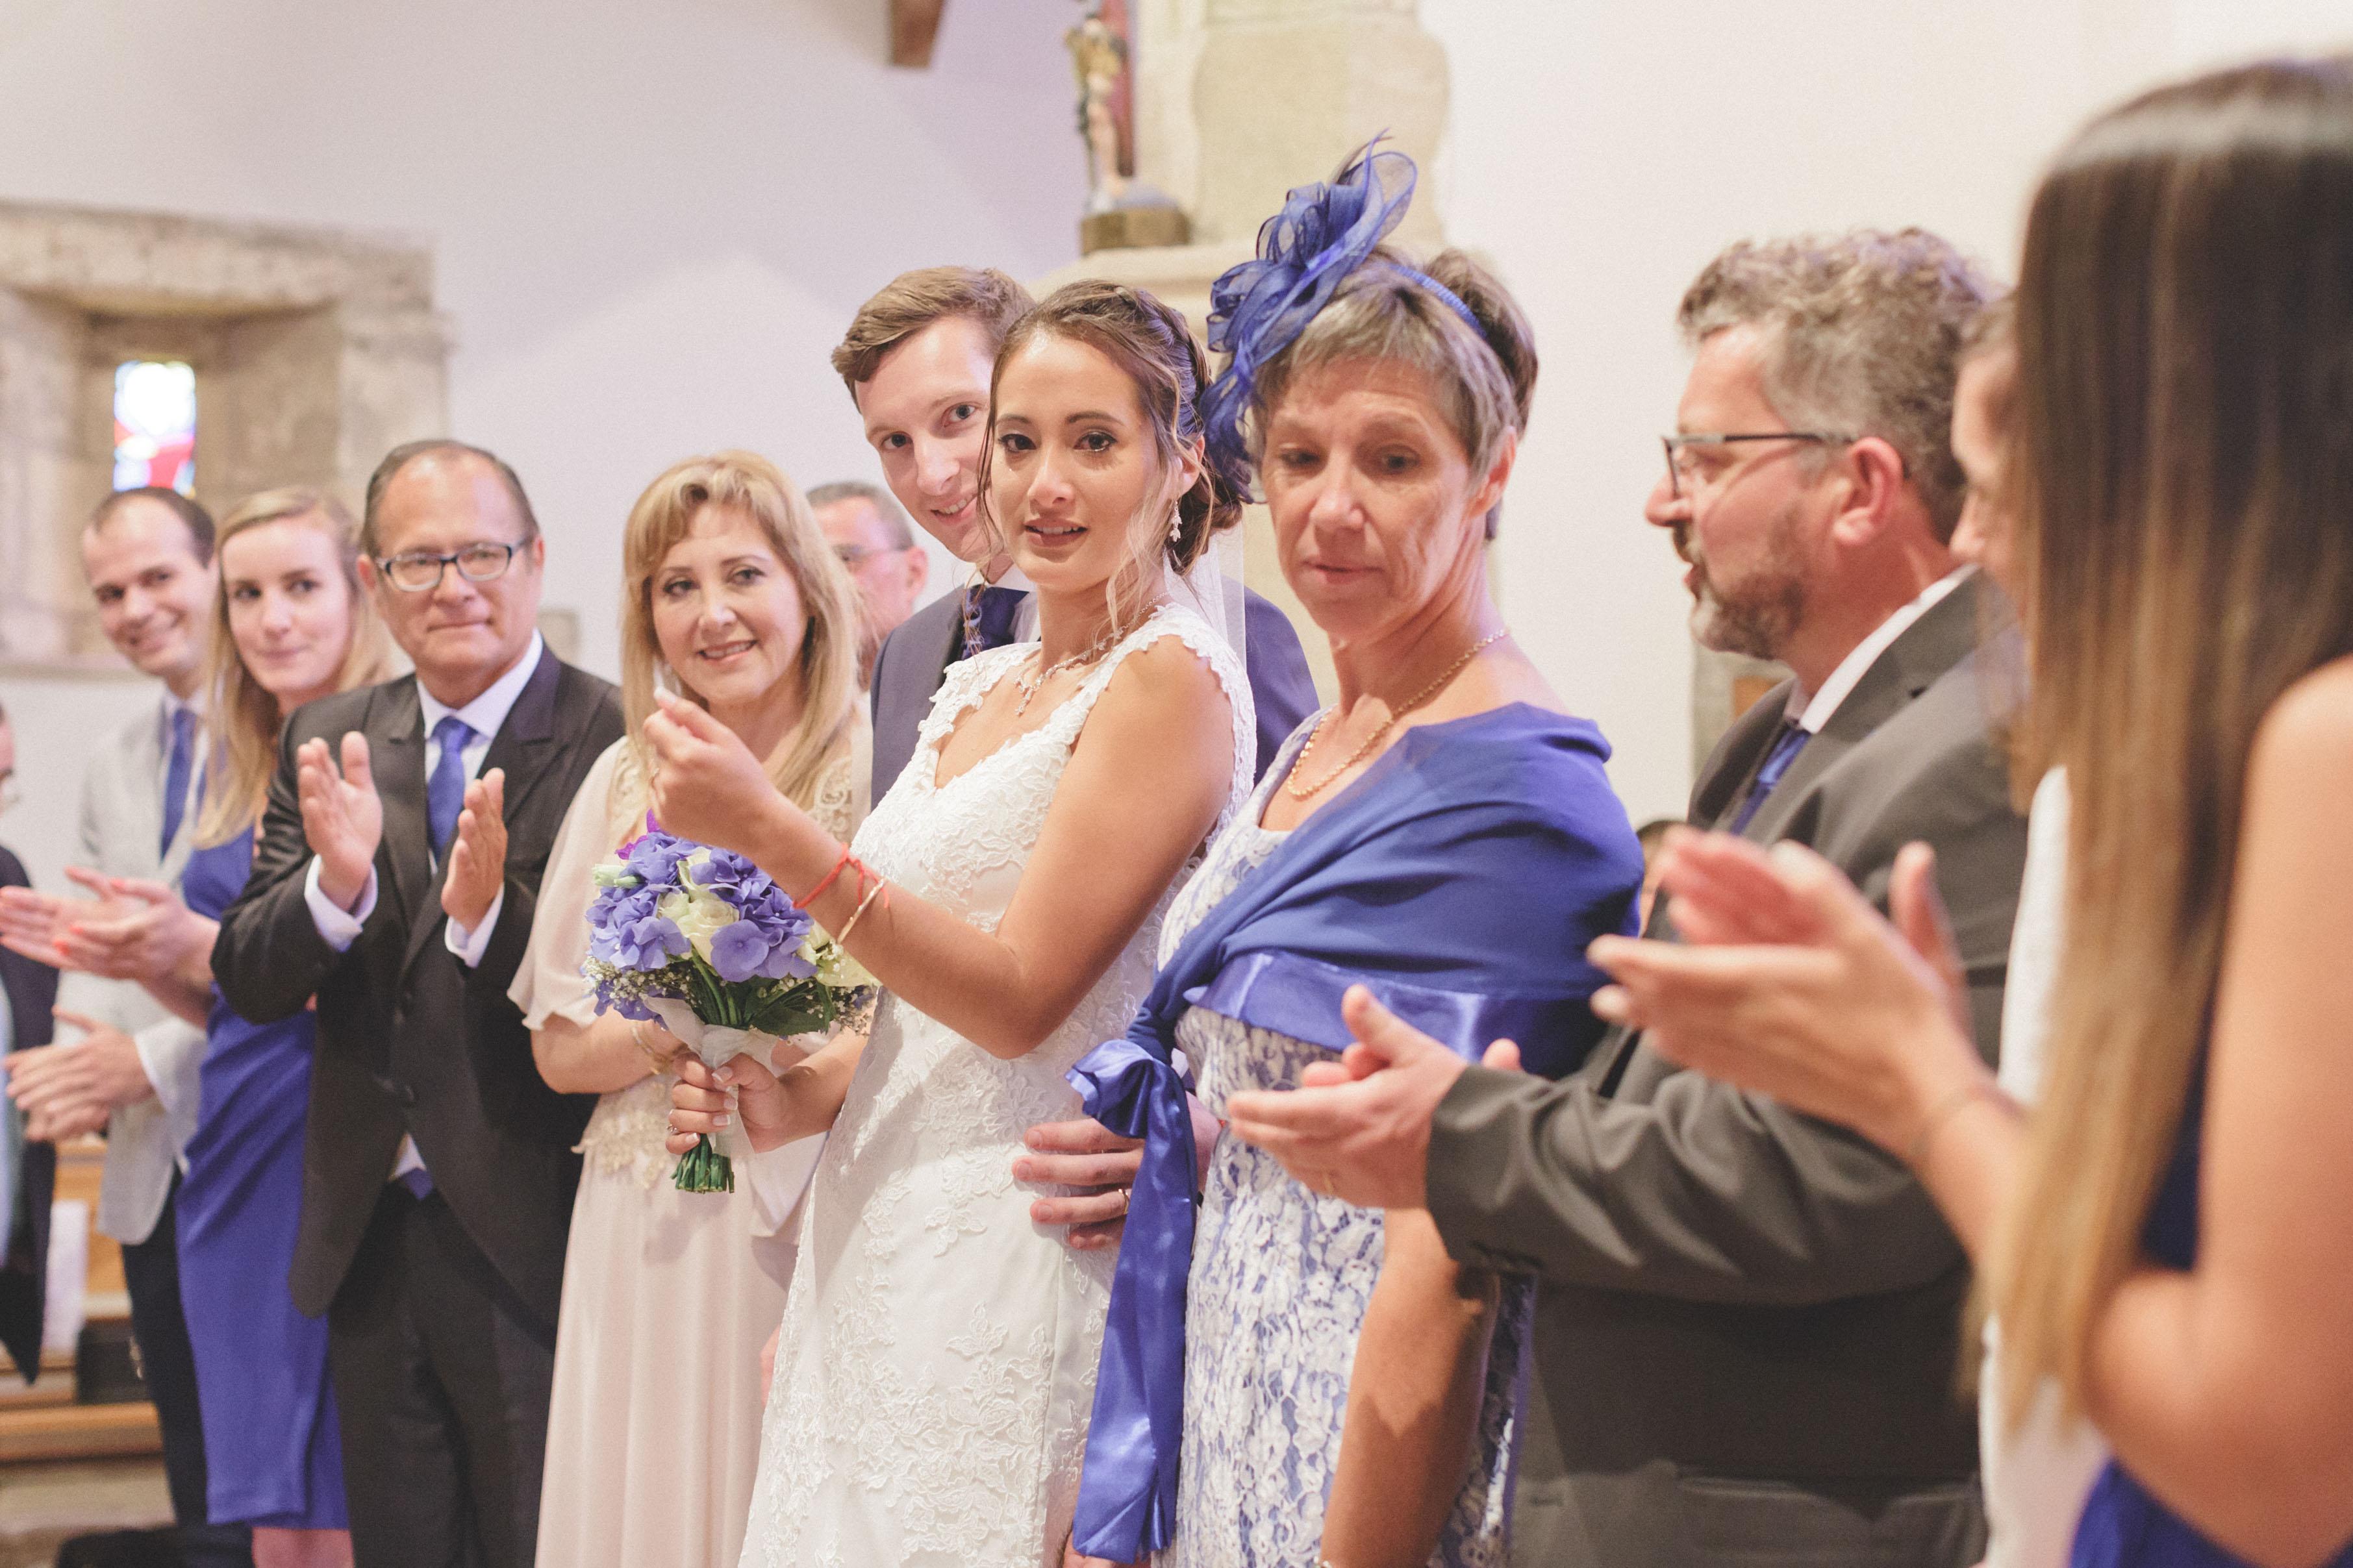 Photographie - Mariage - Bretagne - Finistere - Morbihan - Lilian Vezin Photographie (21)